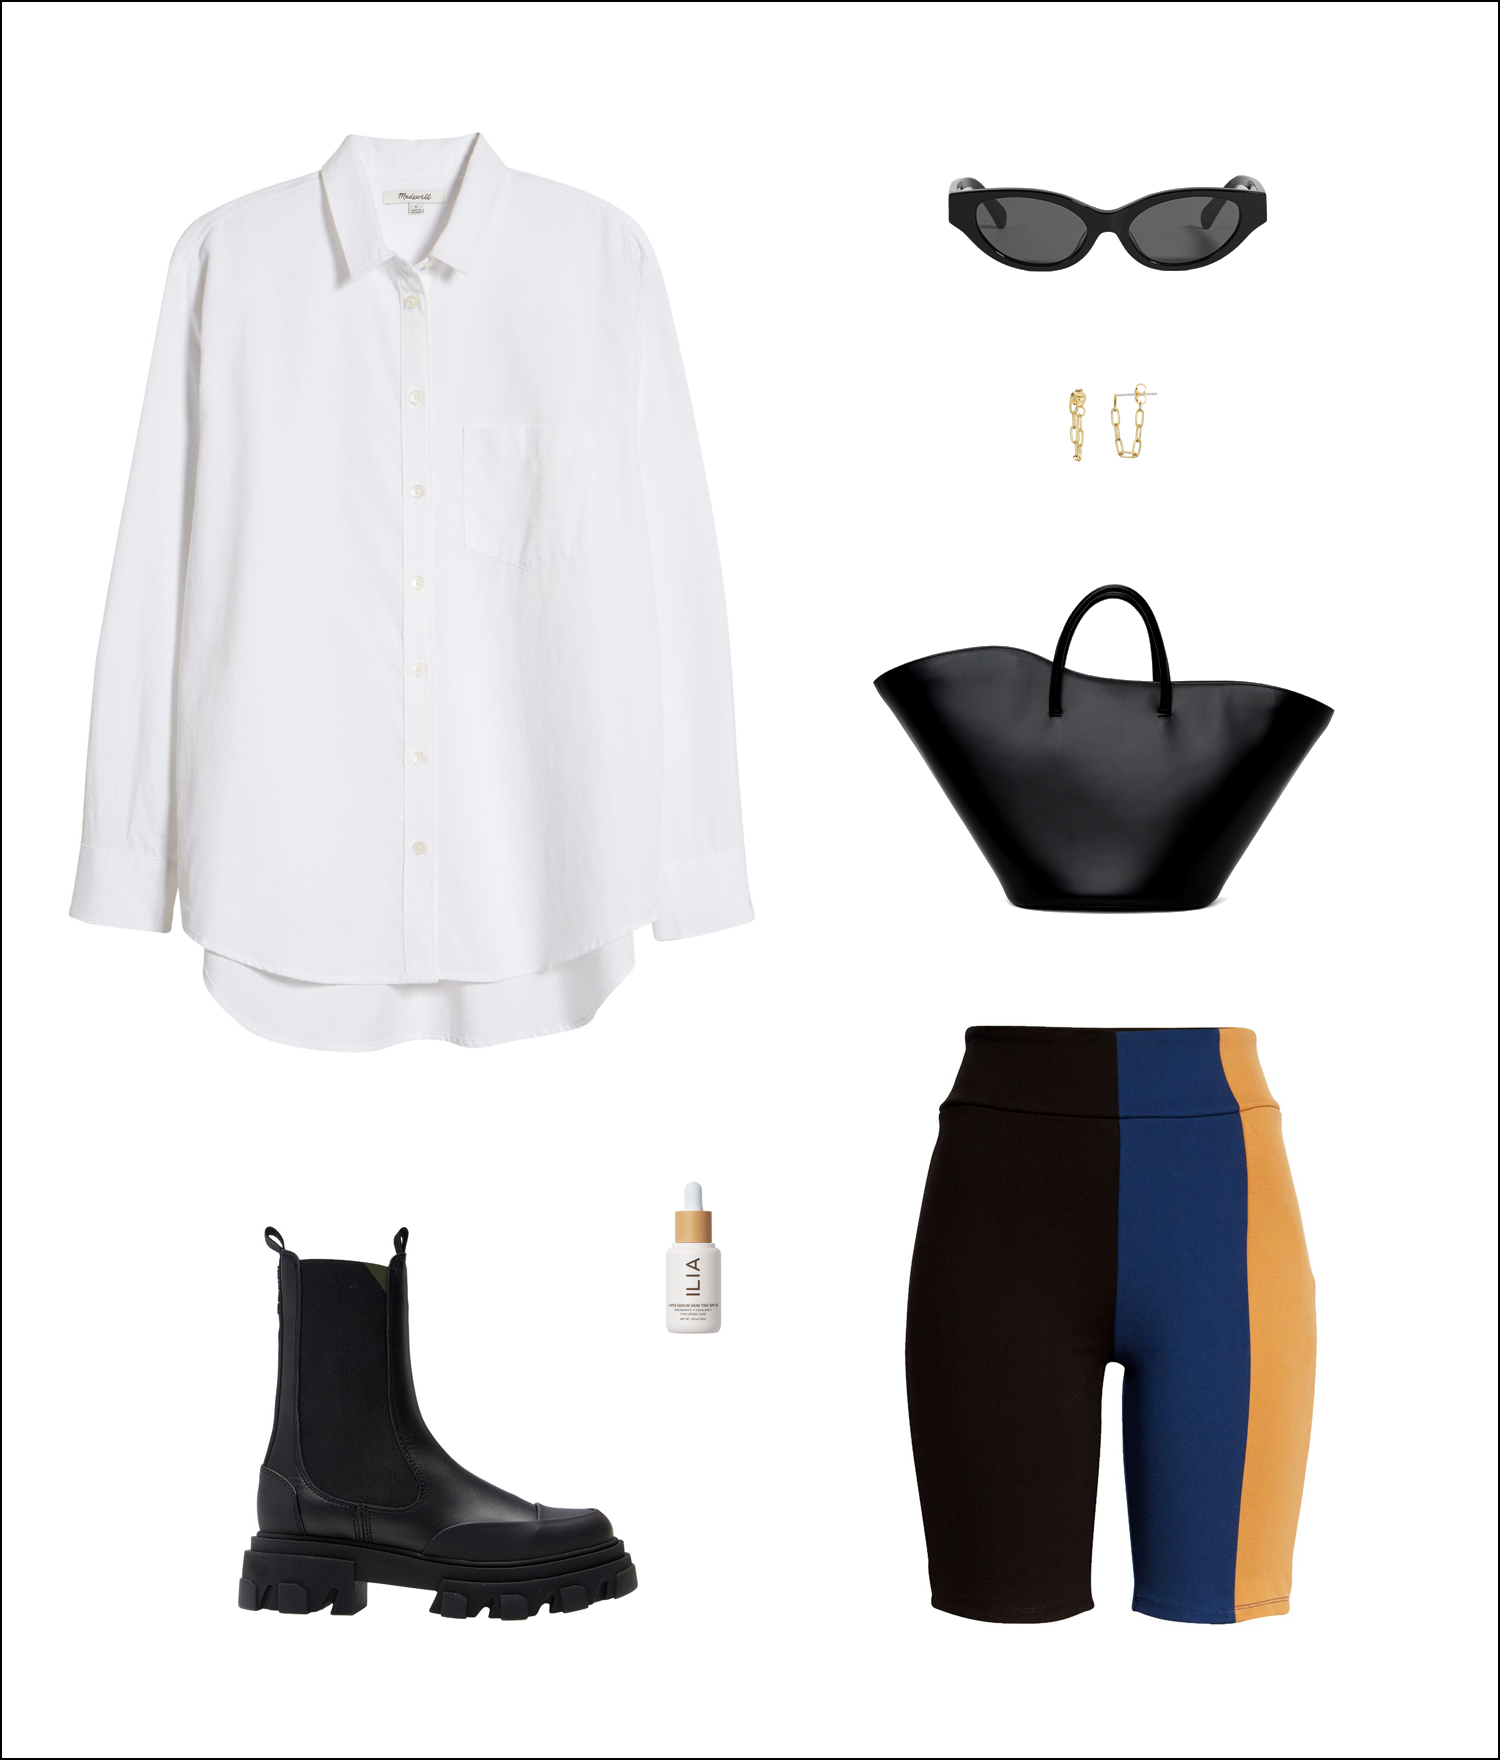 Spring Outfit Idea Trends —under-$100 white button-down shirt, black sunglasses, chain hoop earrings, Little Liffner tote bag, Staud color block biker shorts, Ilia skin tint, Ganni lug-sole boots